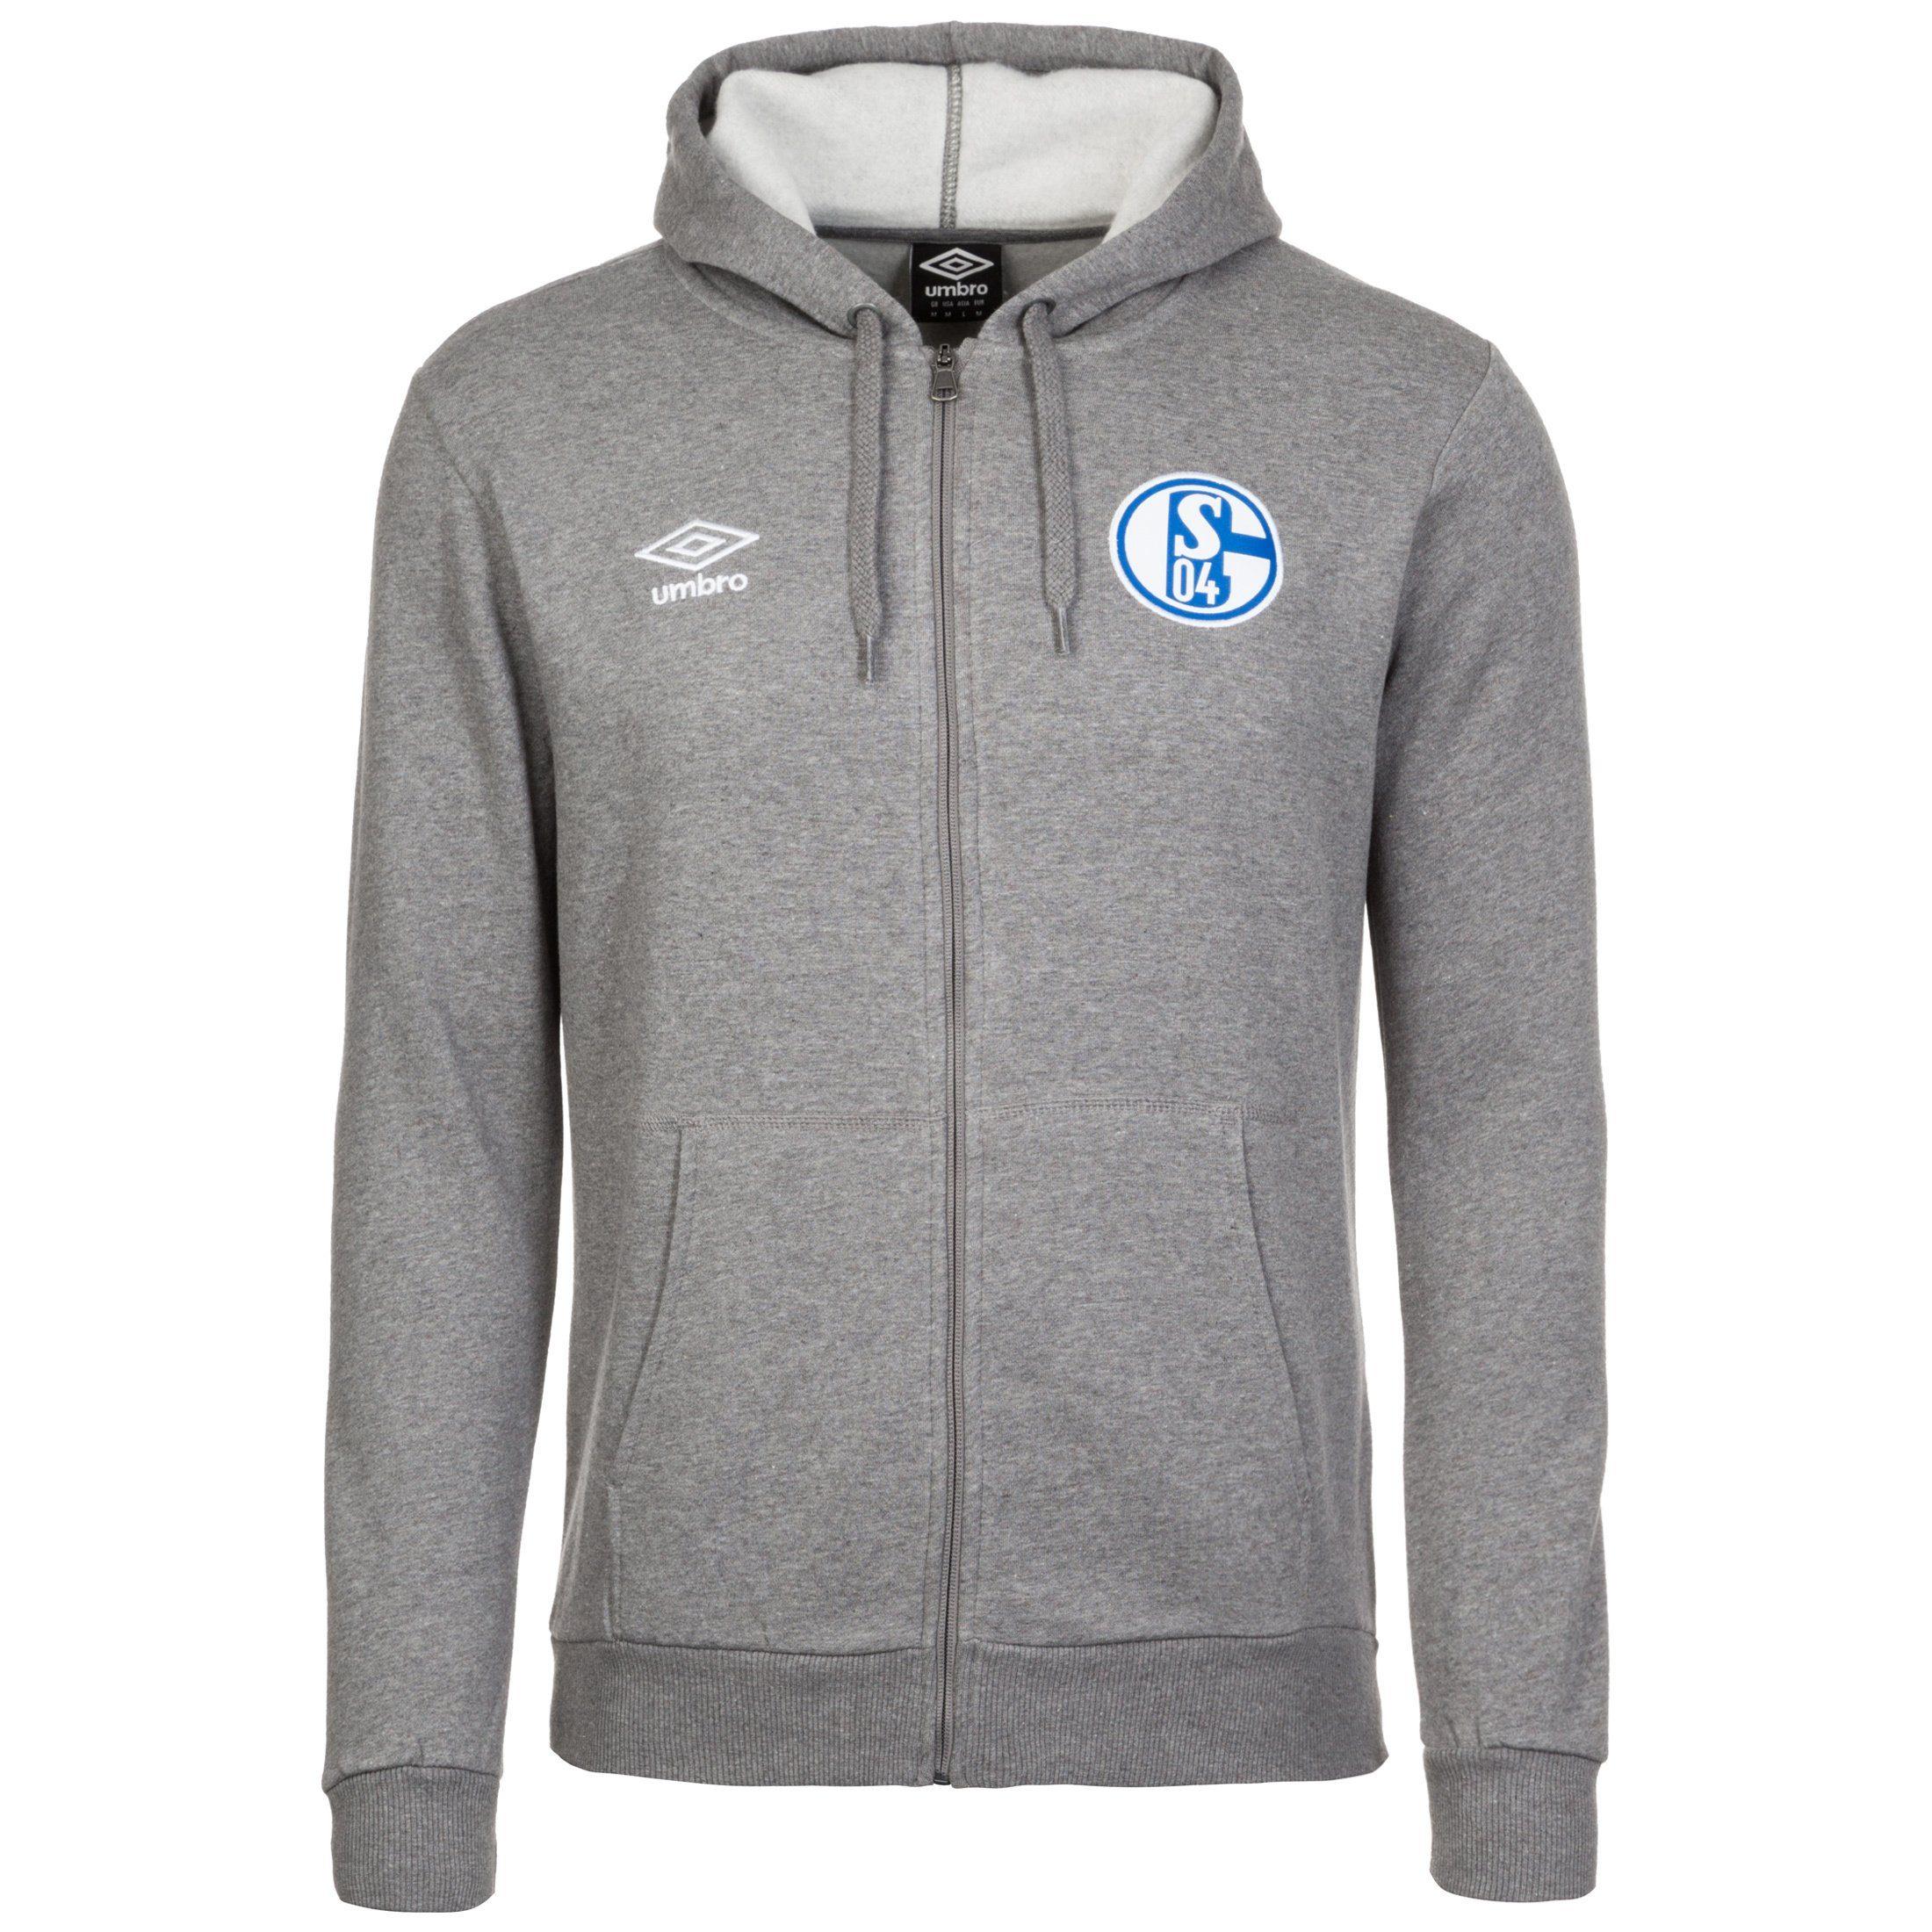 Umbro Trainingsjacke Fc Schalke 04   Sportbekleidung > Sportjacken > Trainingsjacken   Grau   Umbro